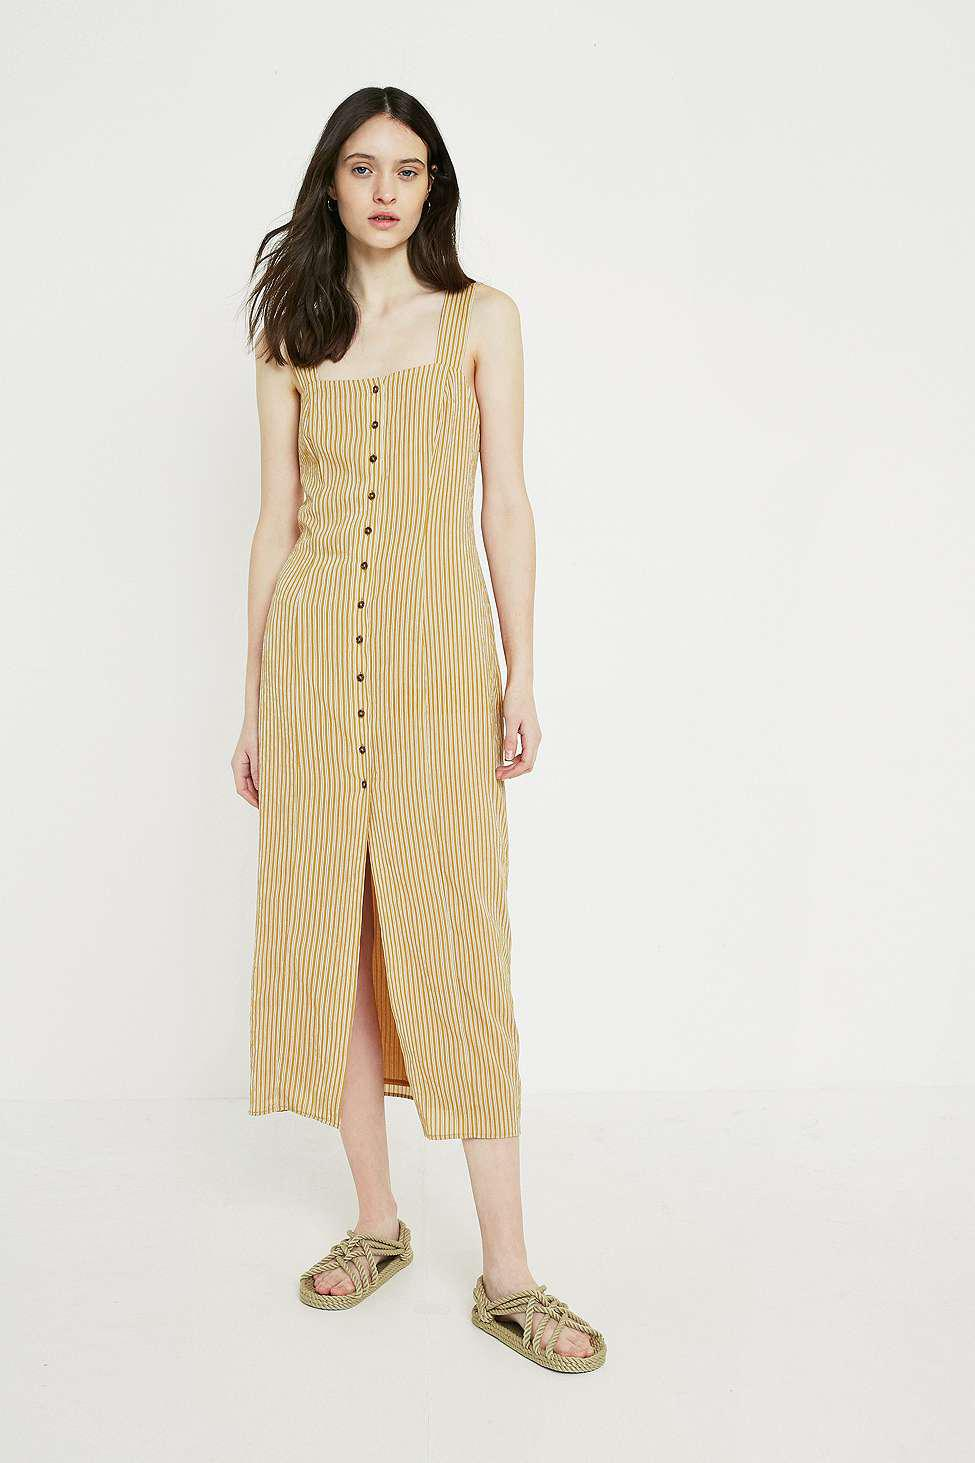 1d9c2d4b838b The East Order Yarrow Yellow Midi Dress - Womens Xs in Yellow - Lyst